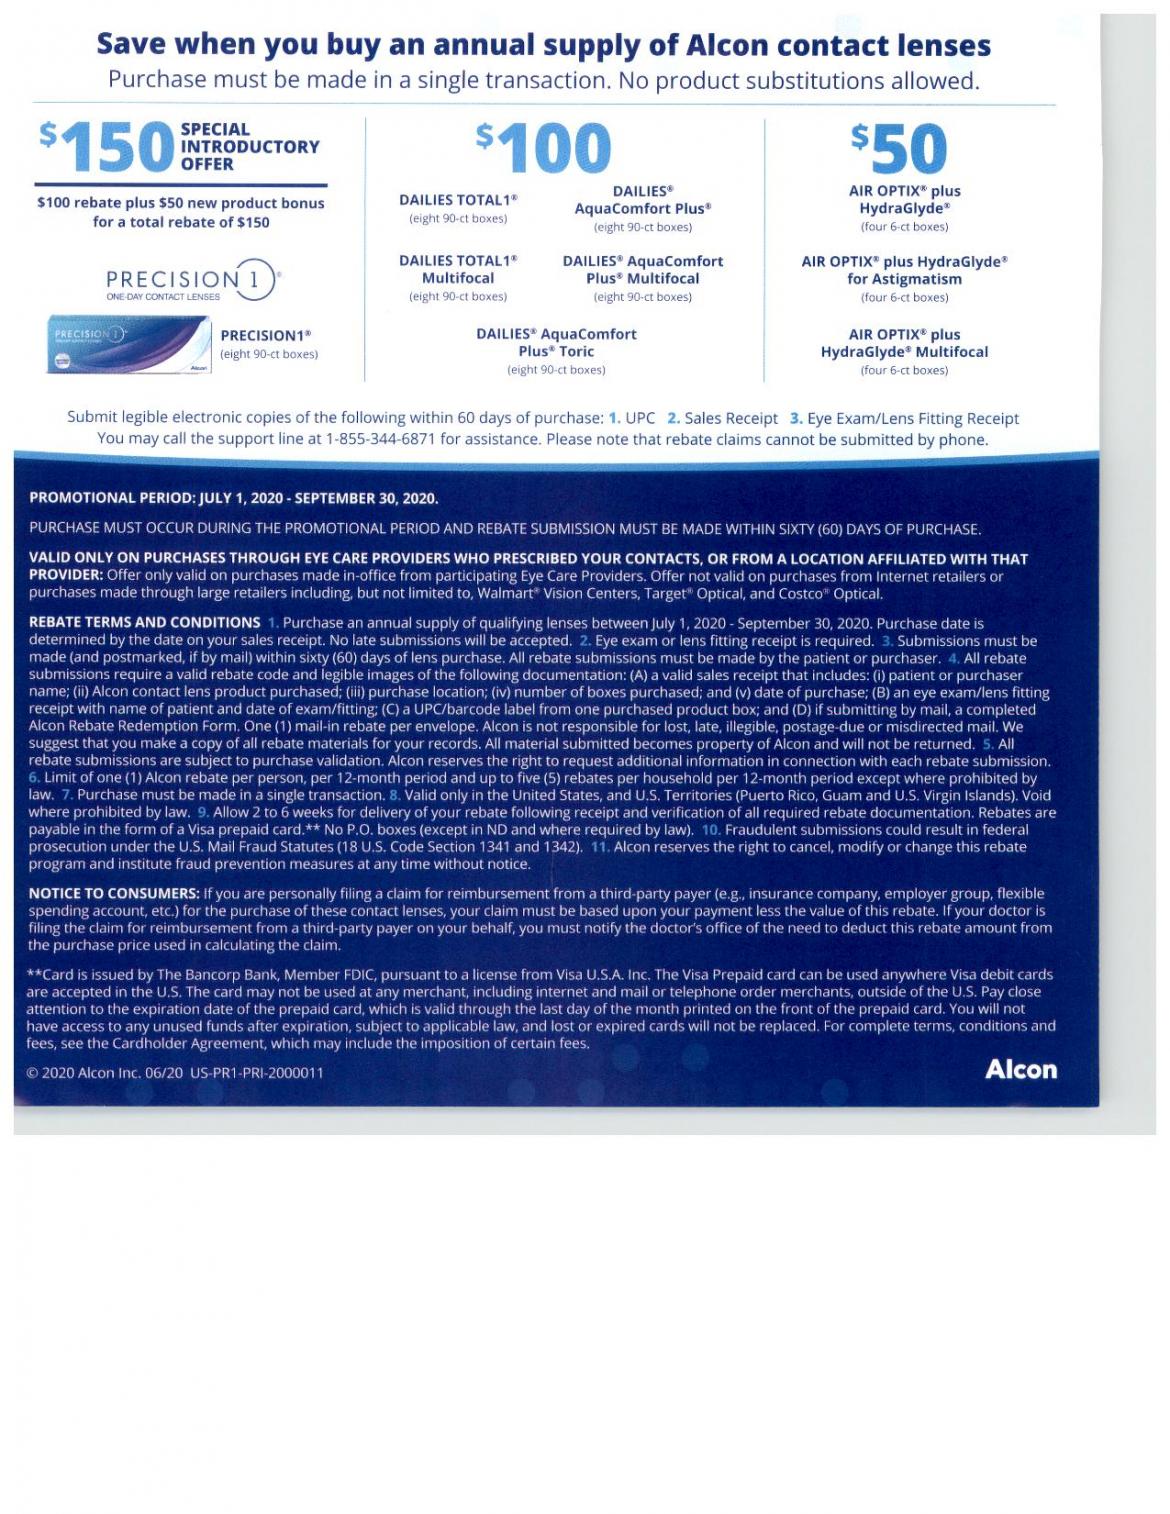 Alcon-rebate-page-002.jpg